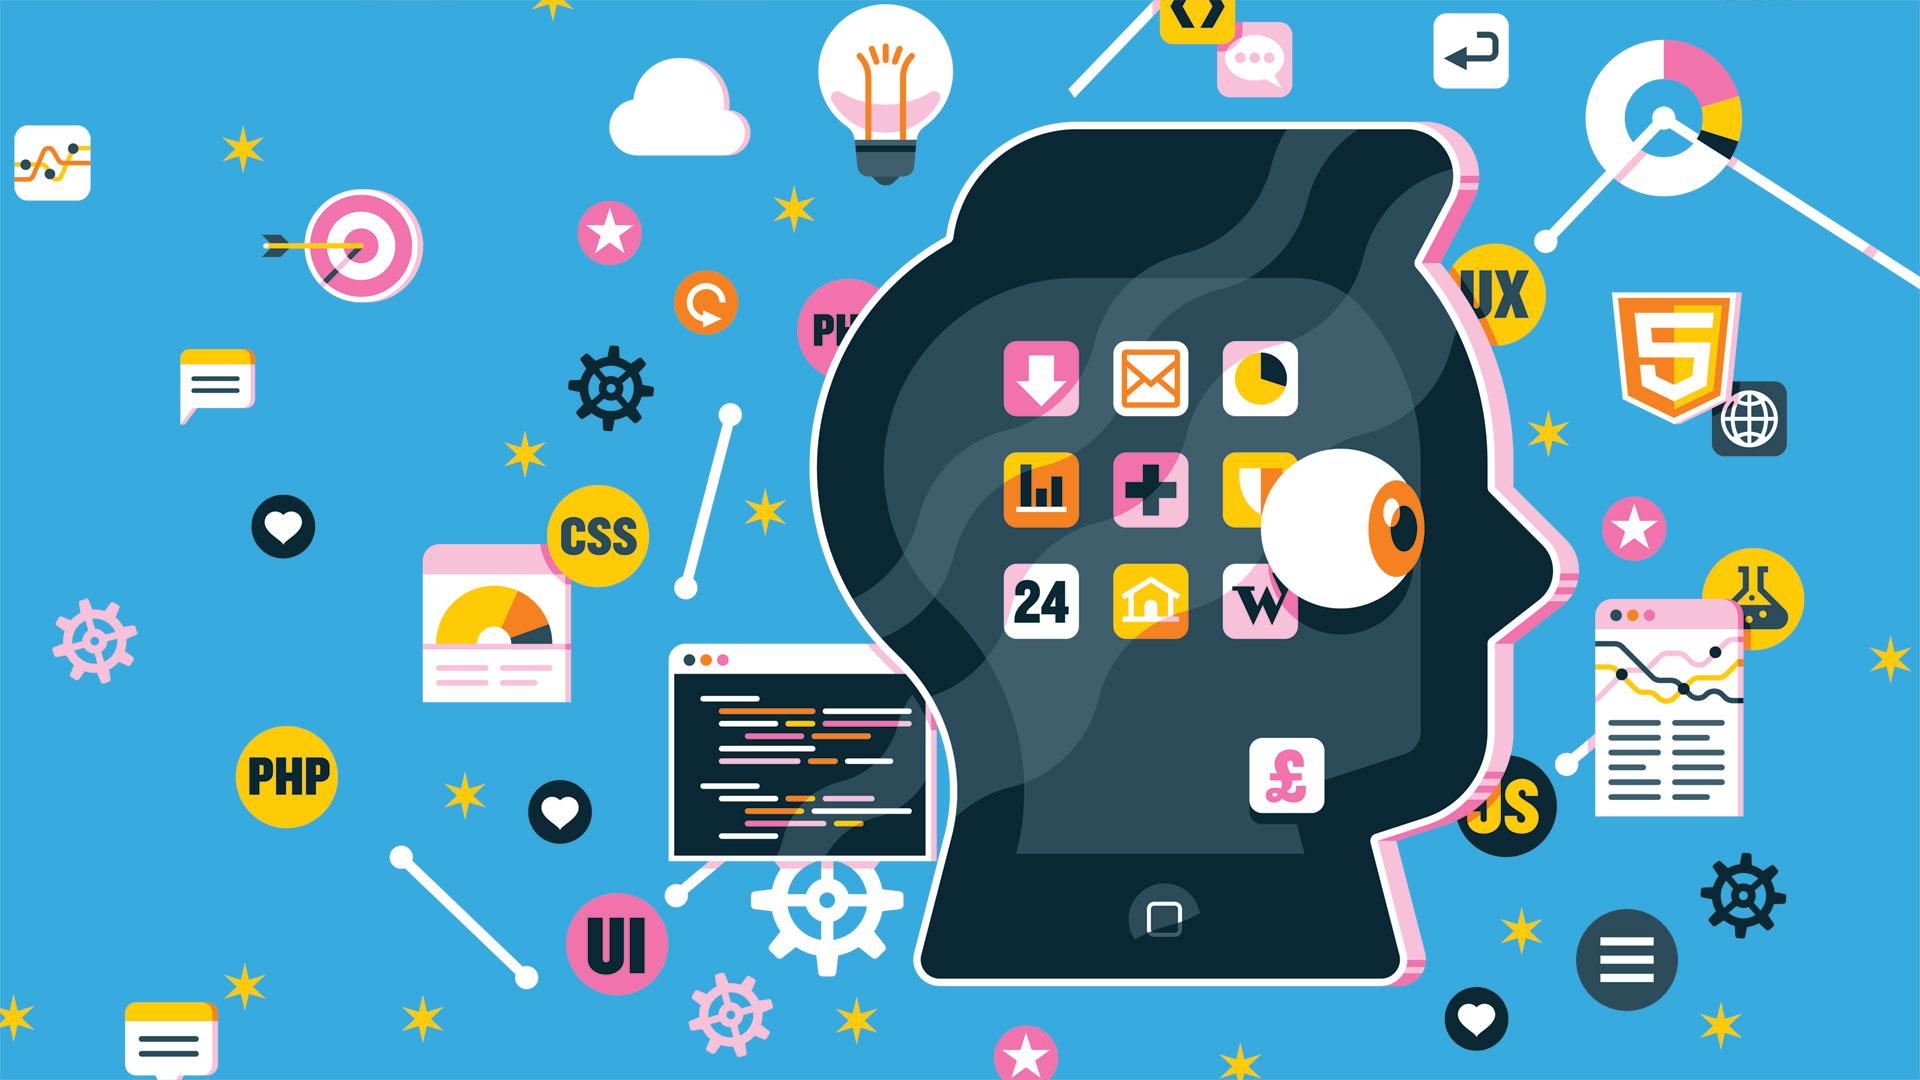 New skills in web design